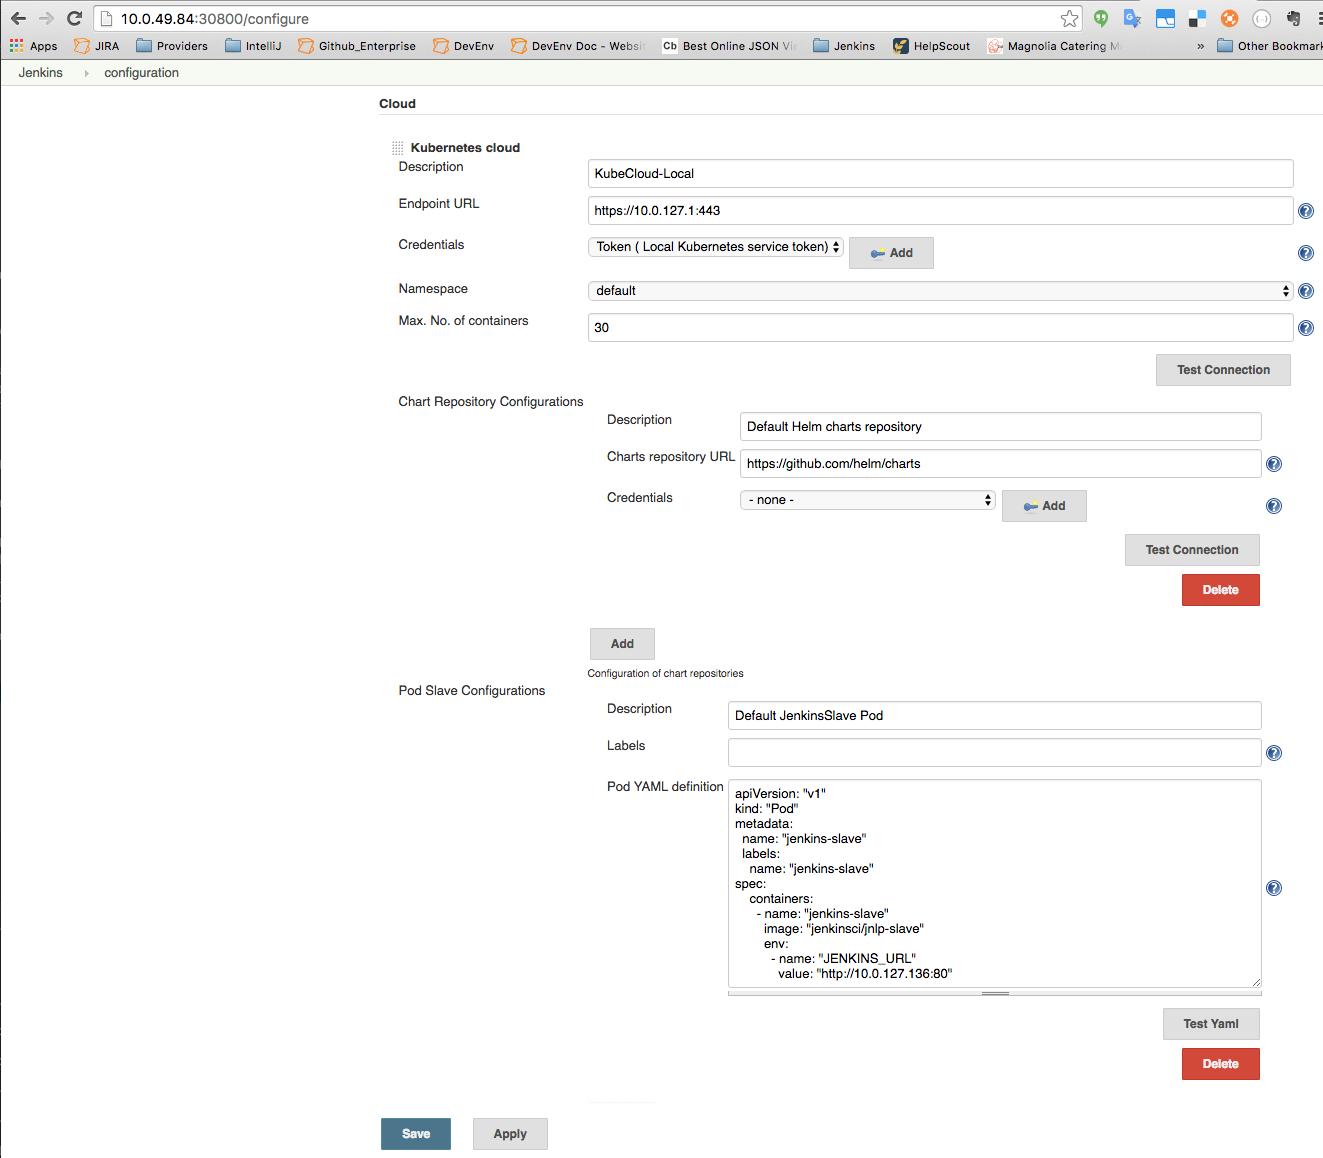 Cloud configuration screenshot